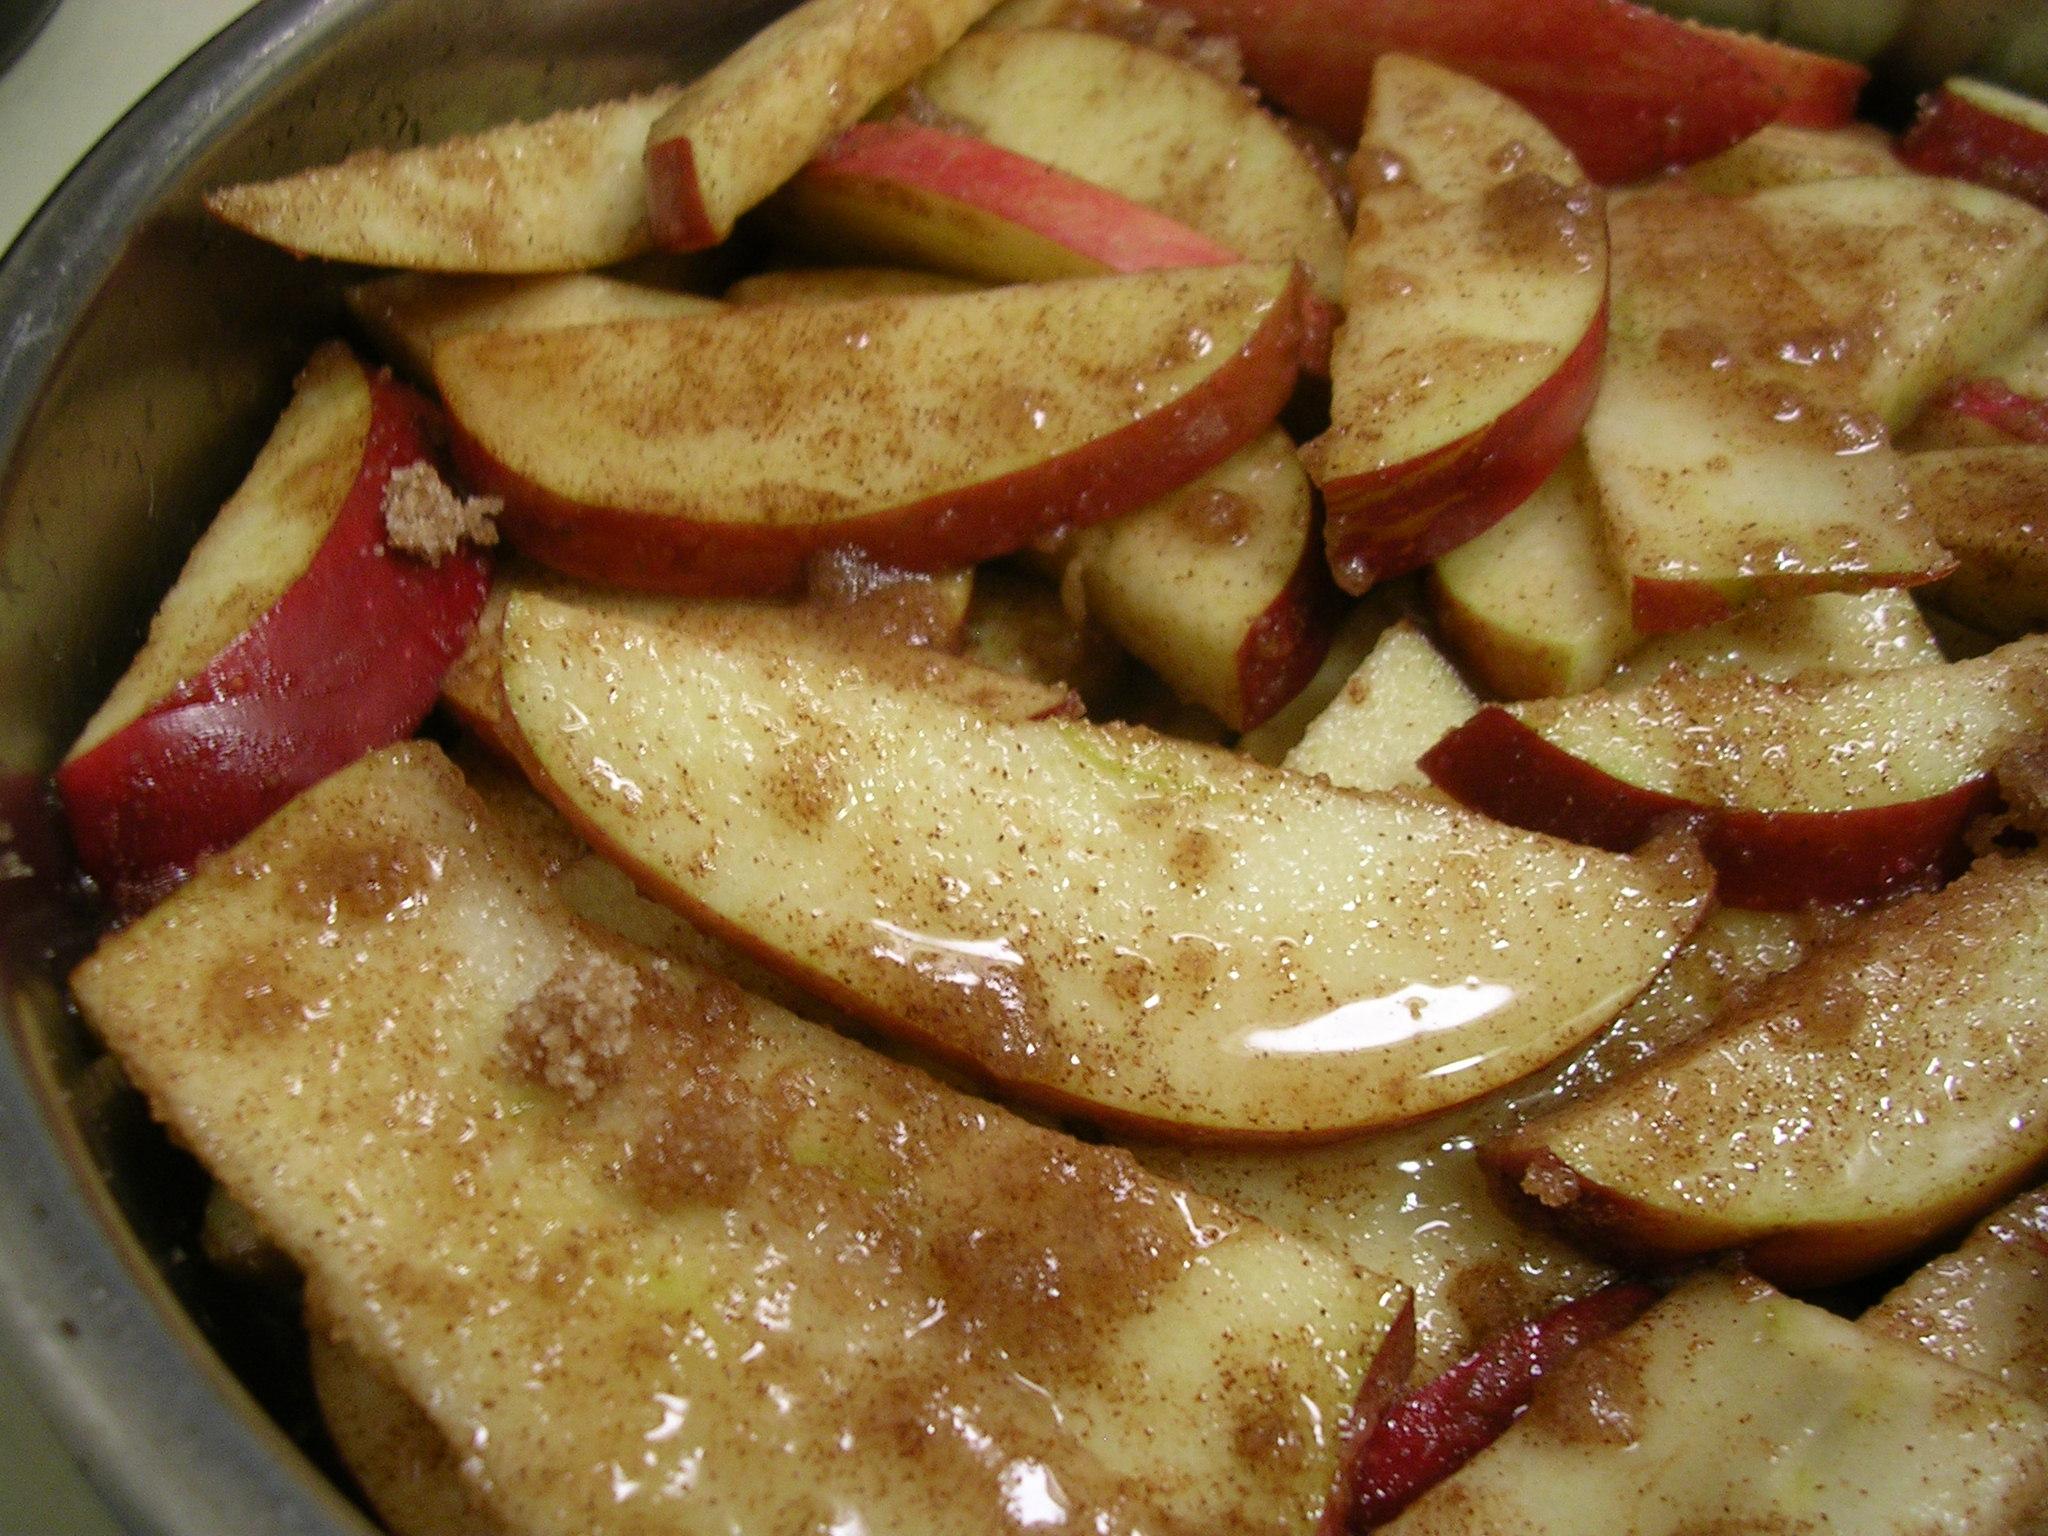 Fetching Baking Pan Apple Crisp A La Mode My Edible Memories Sliced Baked Apples Apples Pecans Sliced Baked Apples No Sugar nice food Sliced Baked Apples